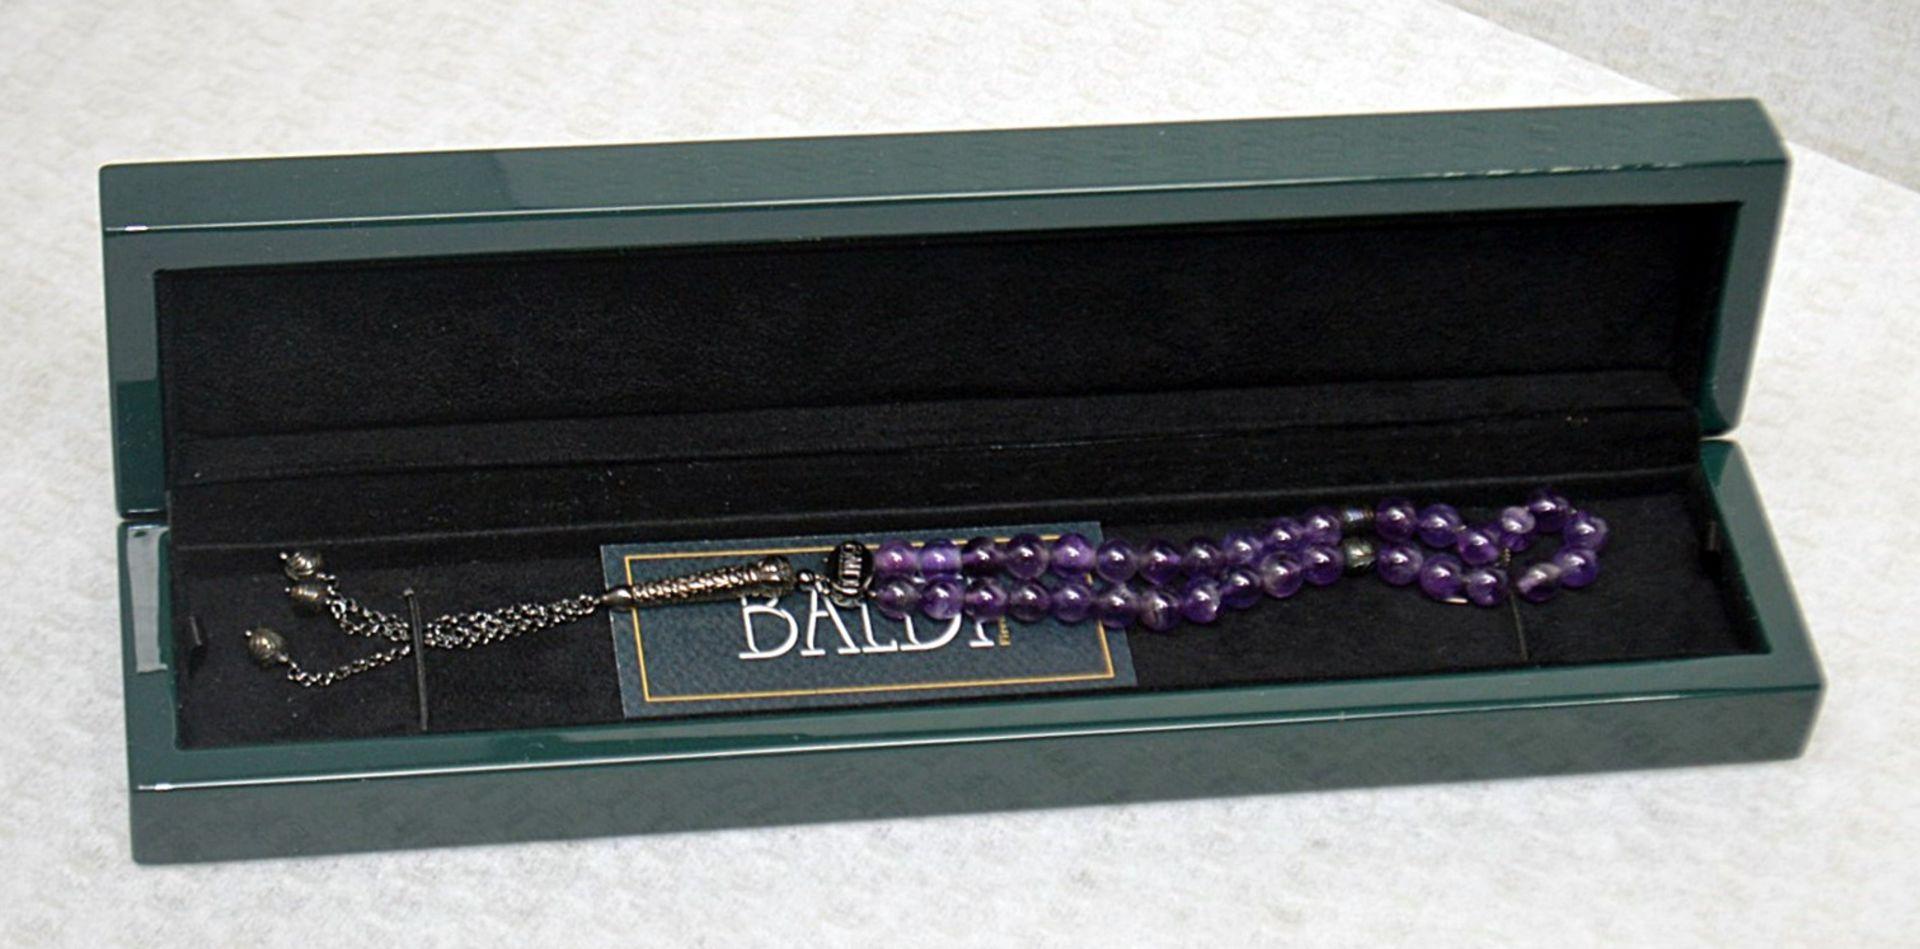 1 x BALDI 'Home Jewels' Italian Hand-crafted Artisan MISBAHA Prayer Beads In Amethyst Gemstone And